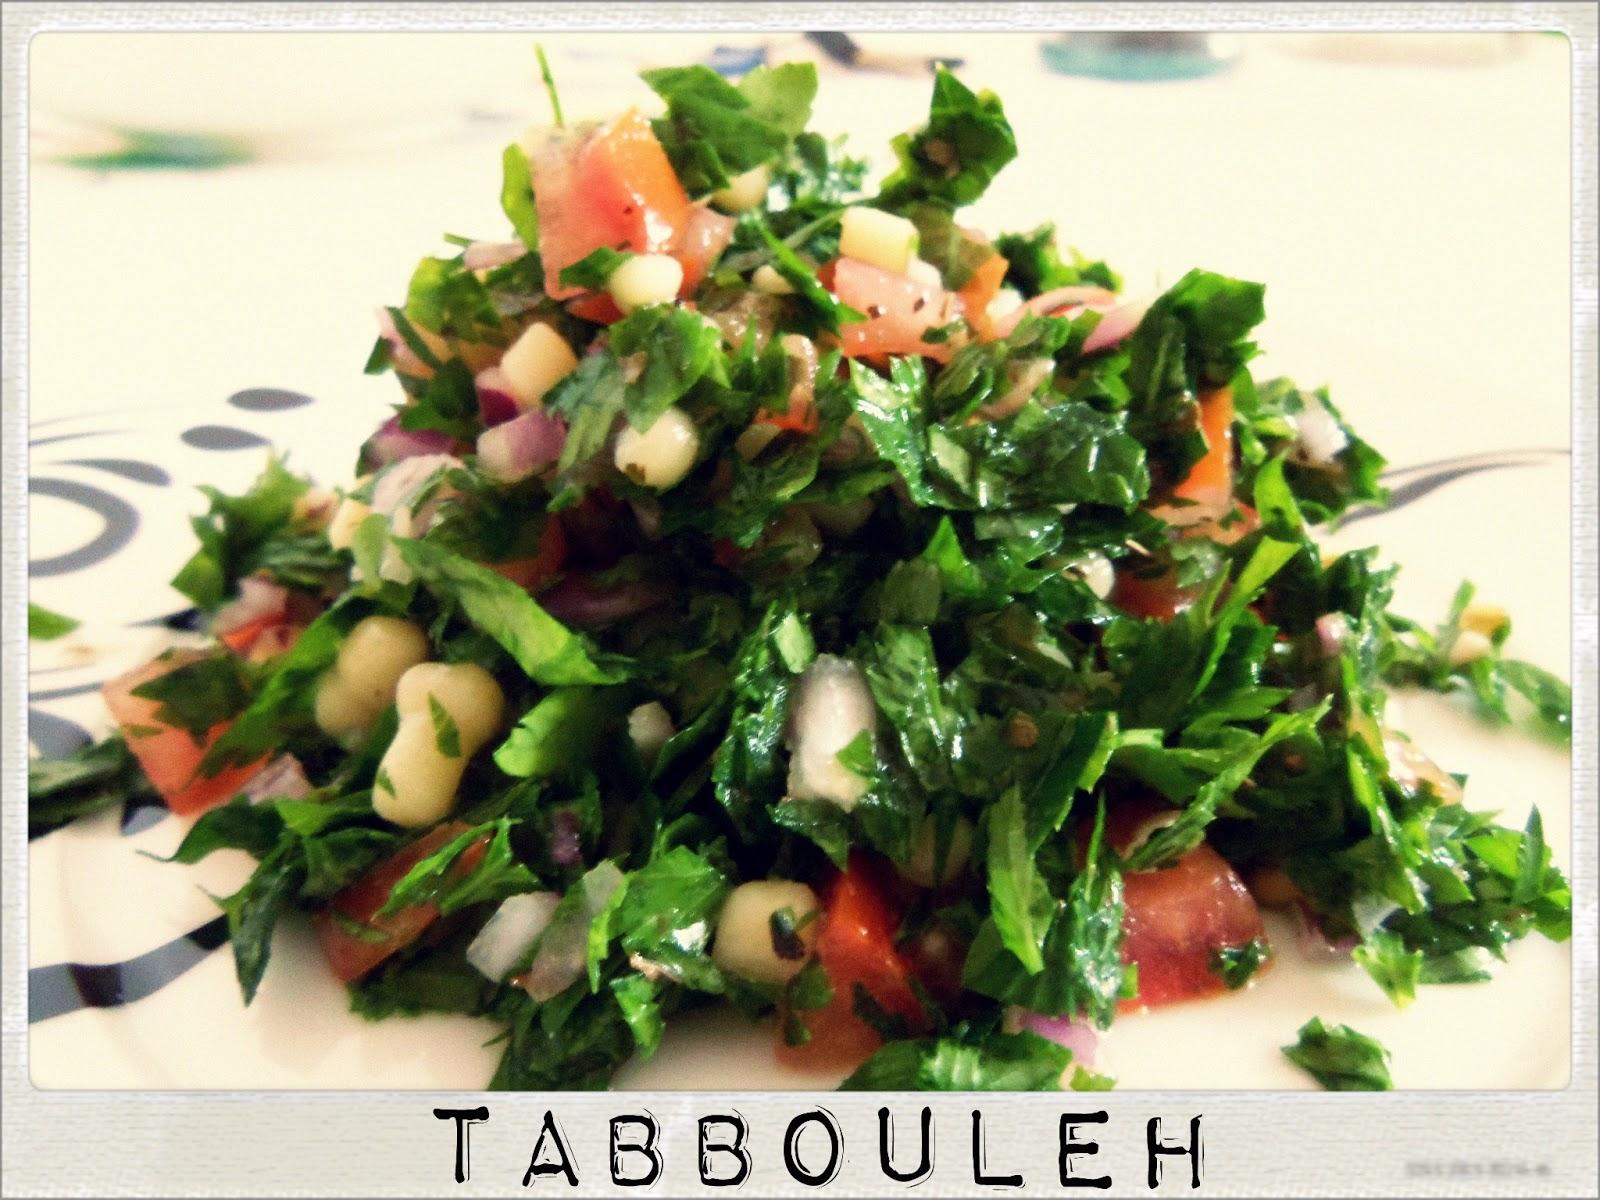 You've Got Meal!: Tabbouleh Salad/ Tabouleh/ Tabouli